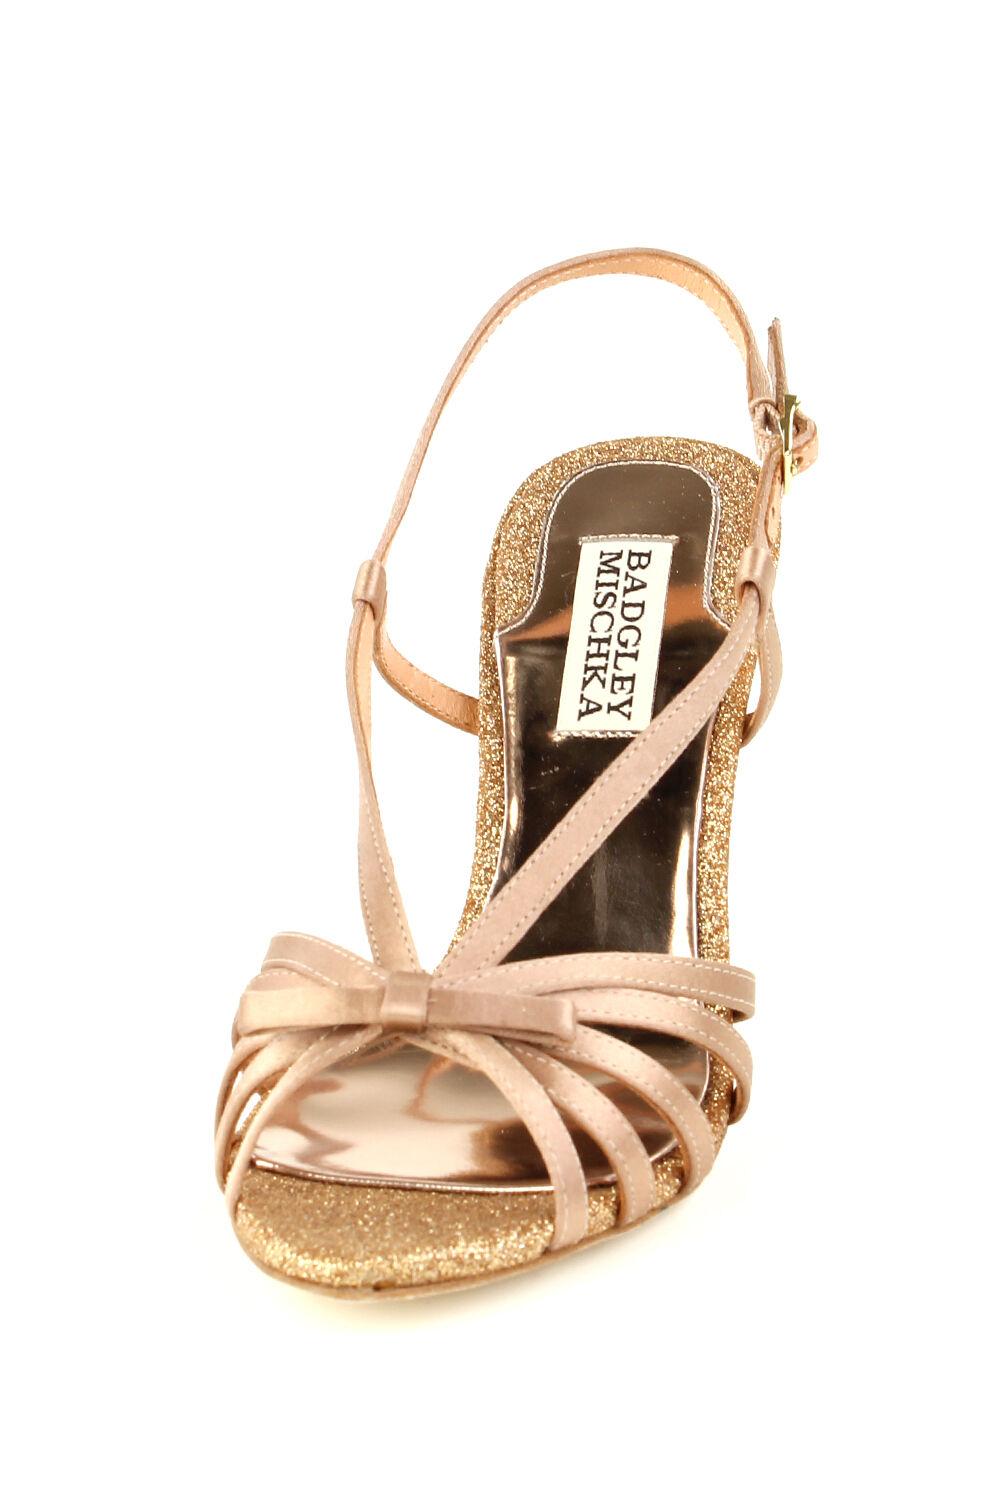 Badgley Mischka WRIGHT Sandals Heels Natural Satin Brand New New New in Box Retail  175 1b1f54